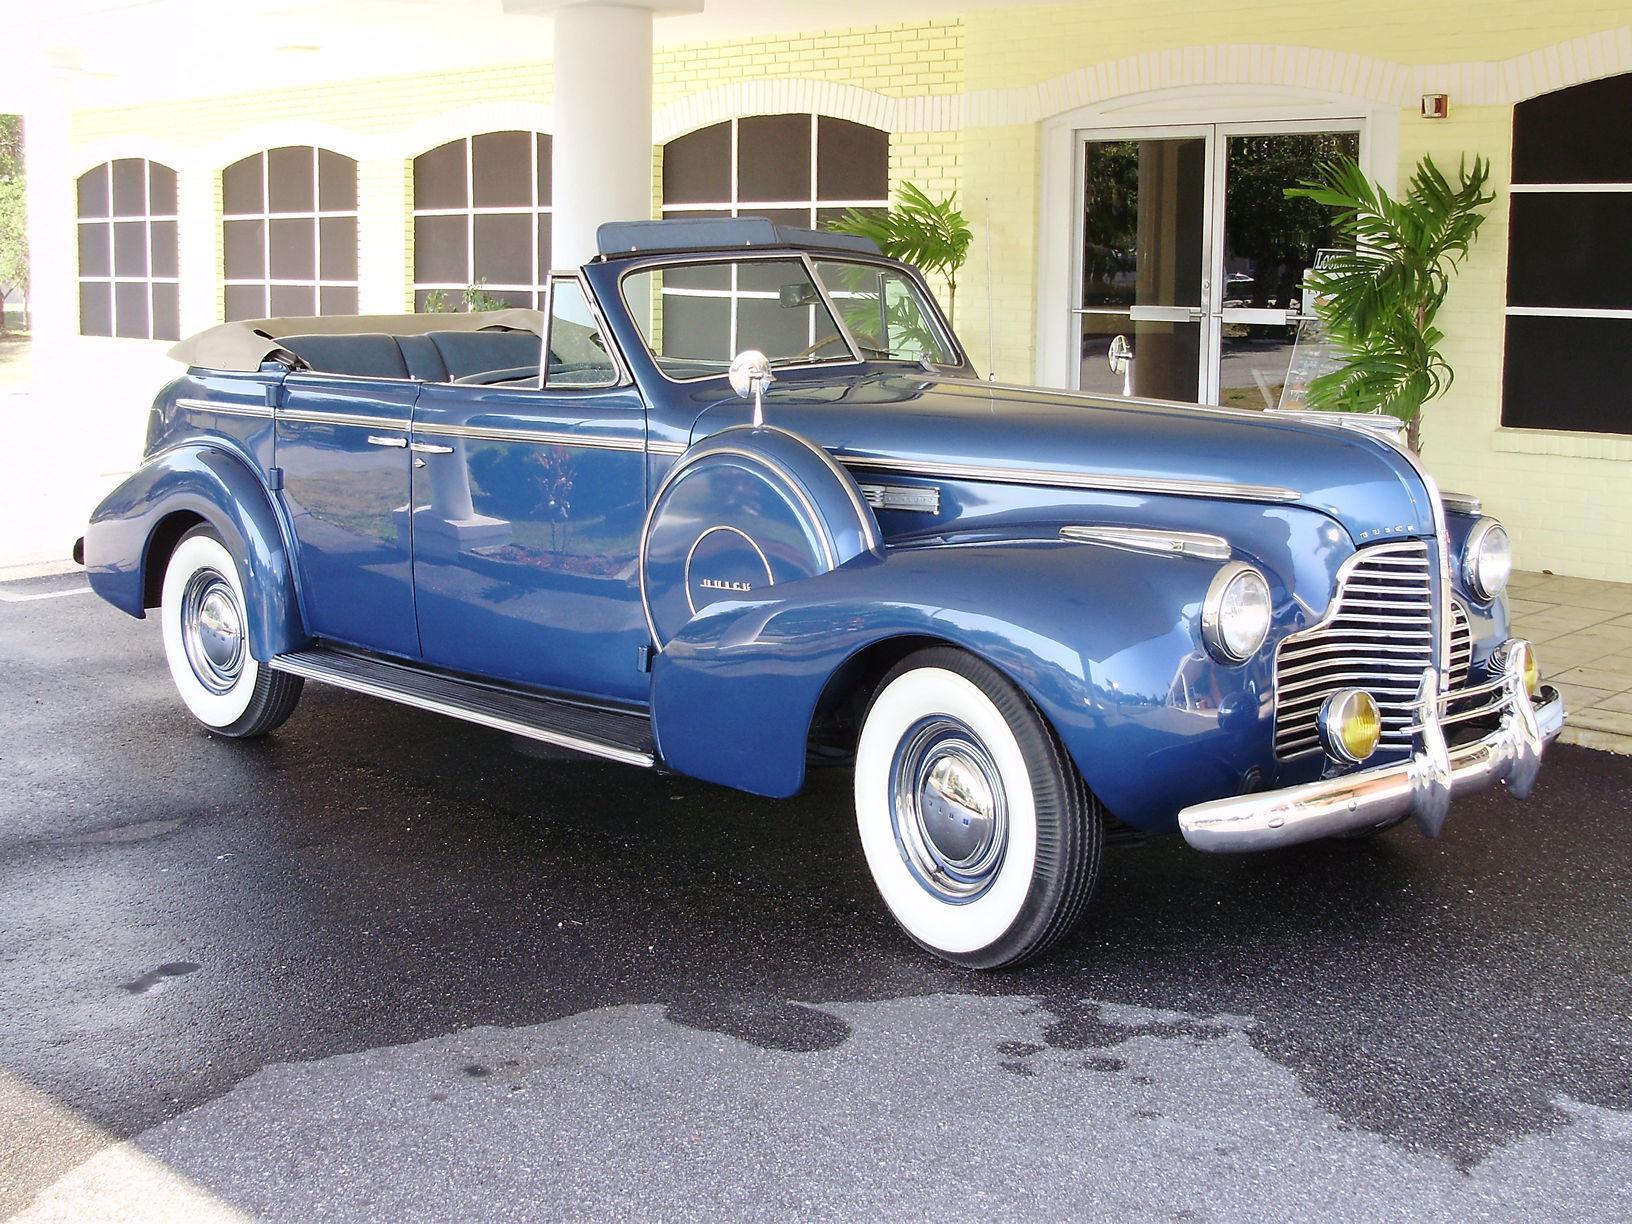 1940 BUICK CENTURY CONVERTIBLE SEDAN - Vintage Motors of Sarasota Inc. #8